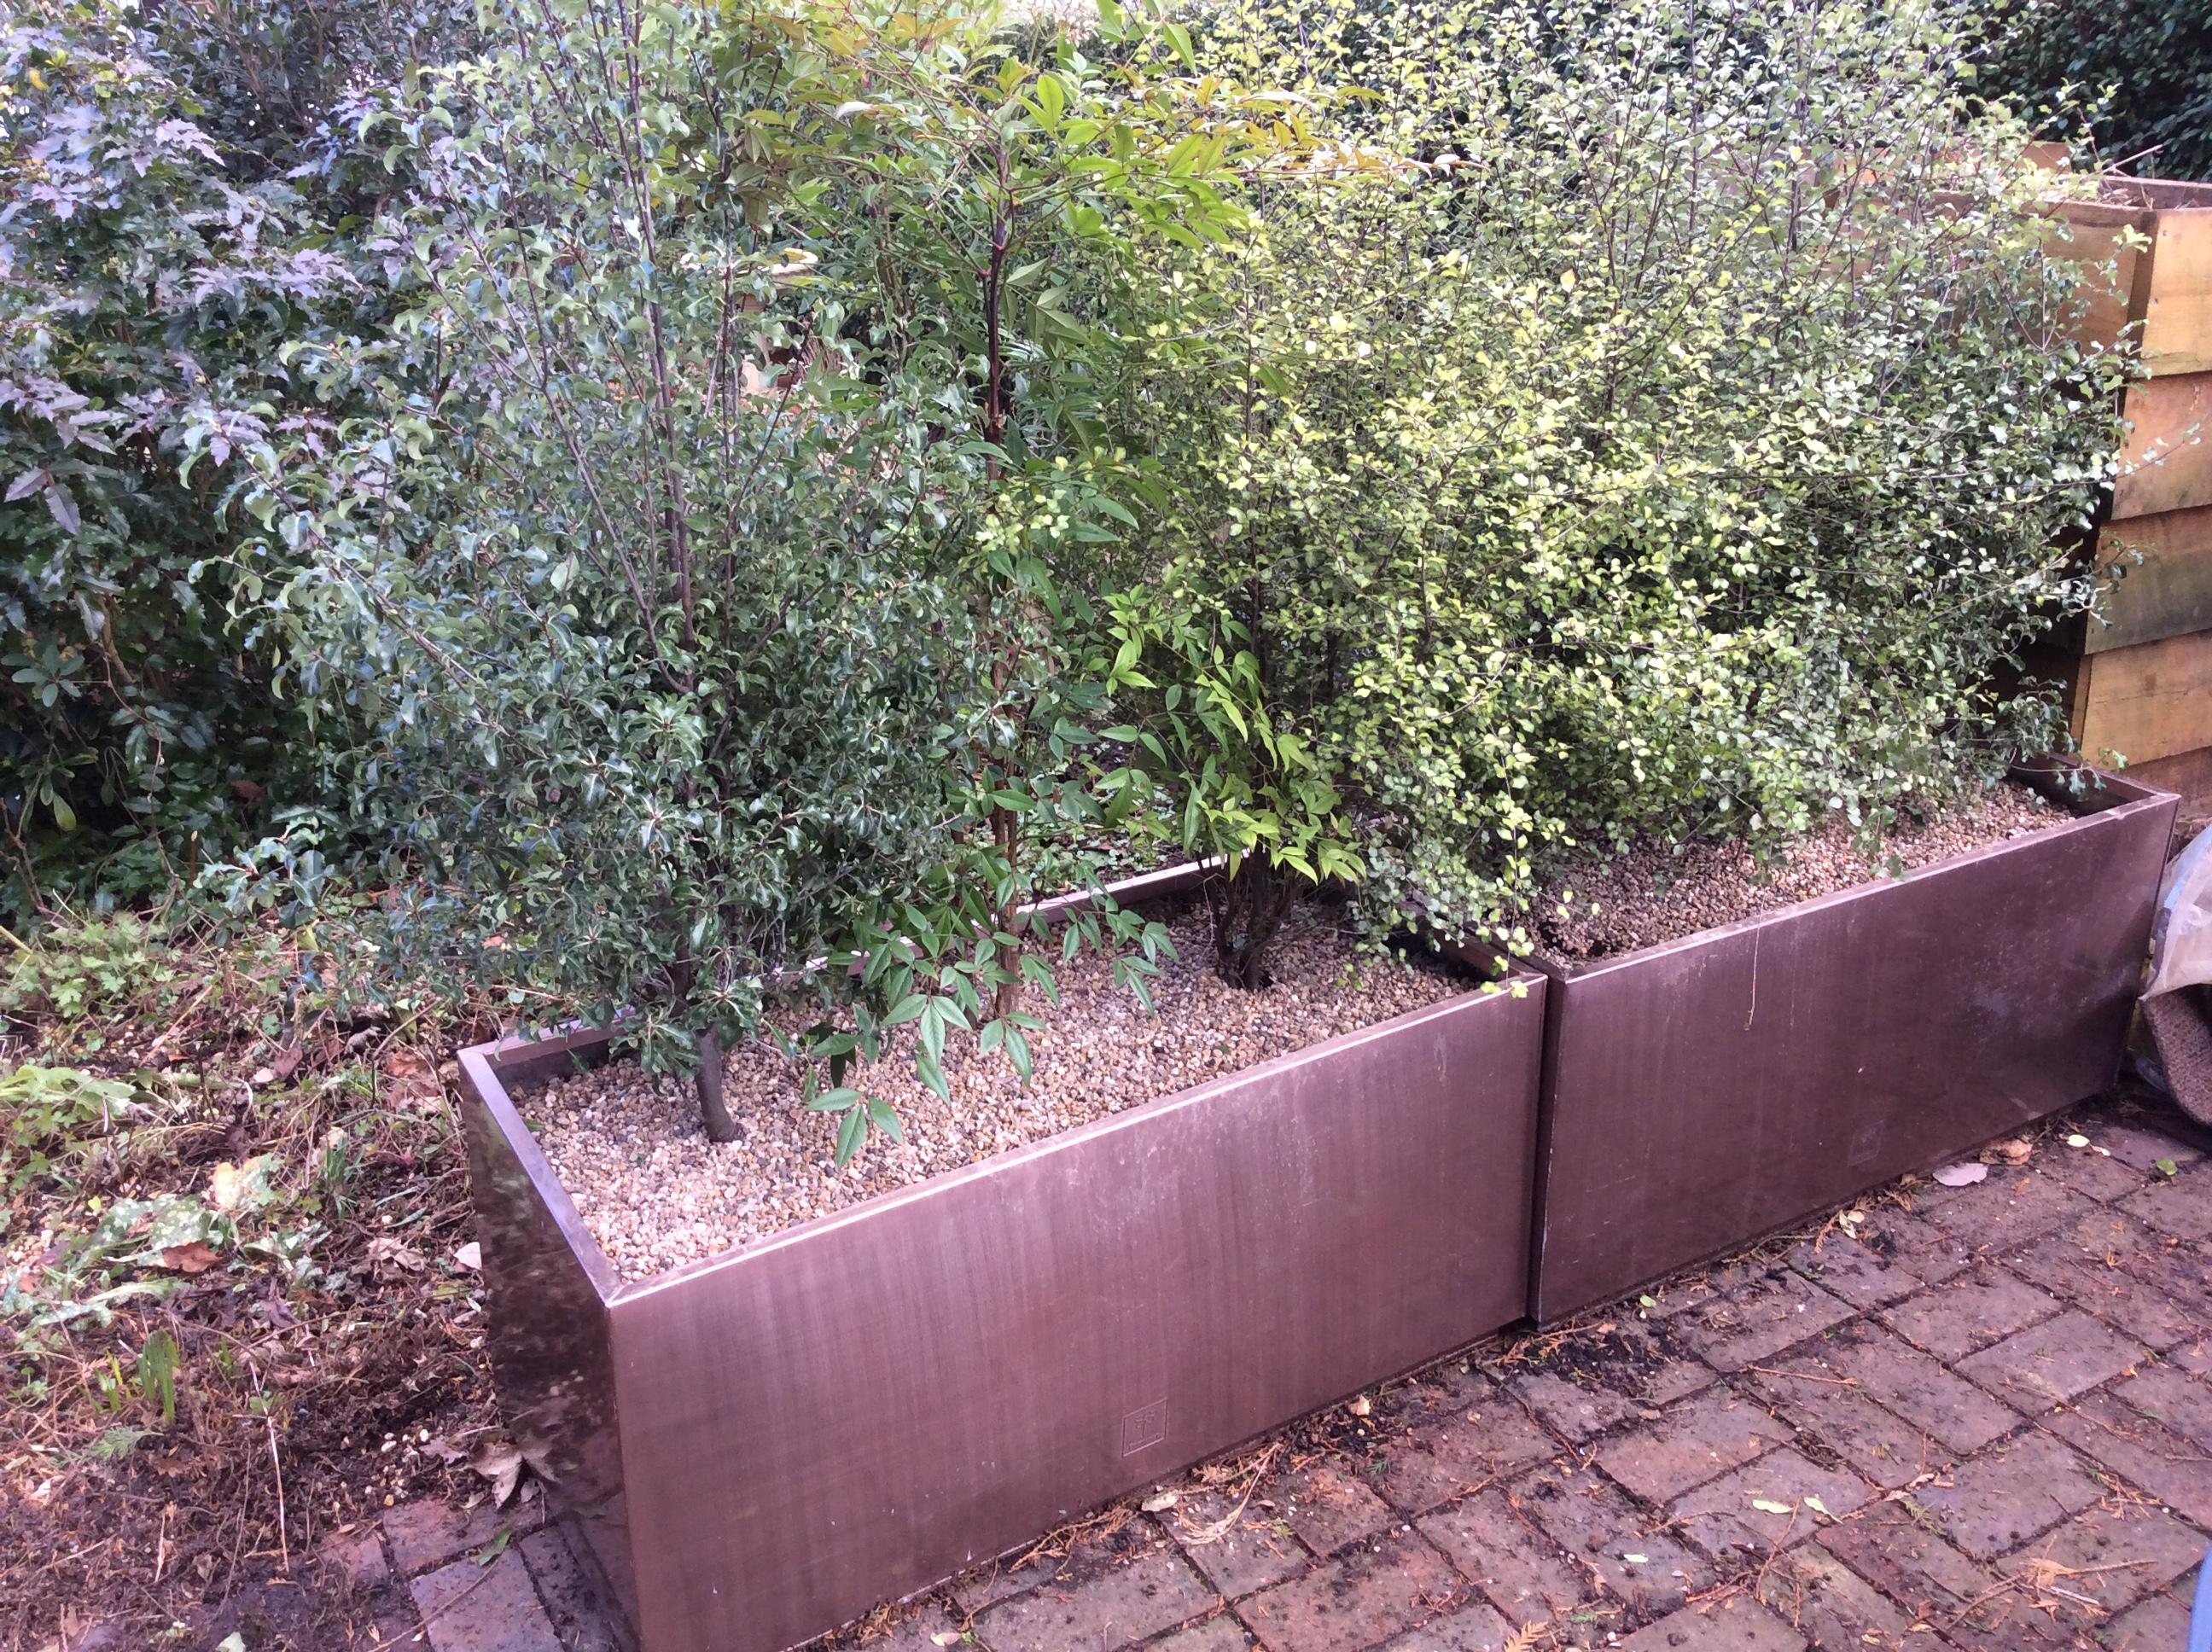 nandina and pittosporum shrubs in copper troughs